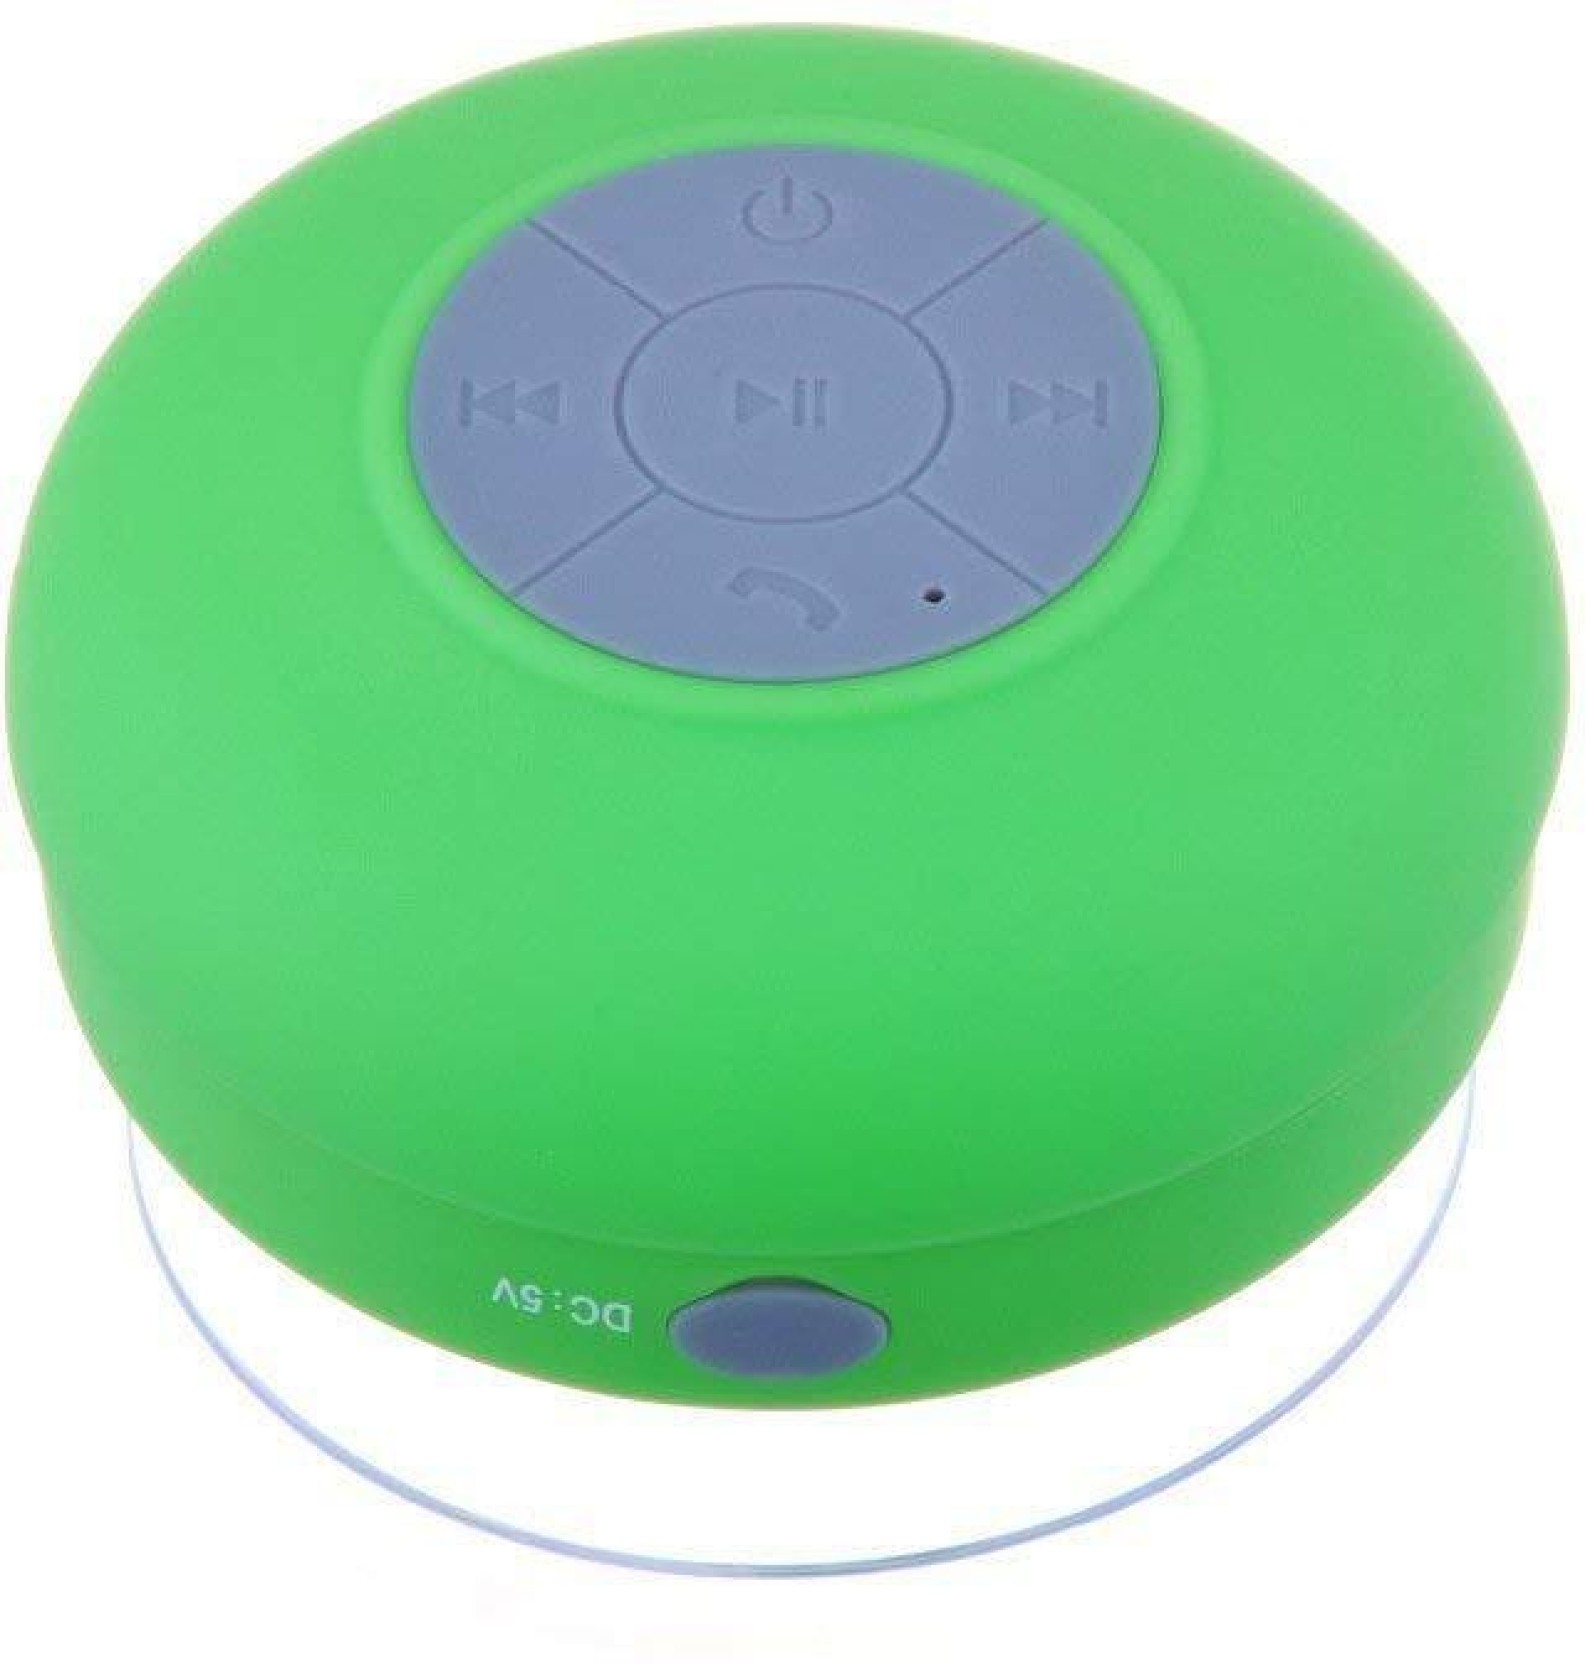 Buy Voltegic Water Proof Bluetooth 30 Speaker Mini Resistant Waterproof Bts 06 Original Wireless Shower 5 W On Offer